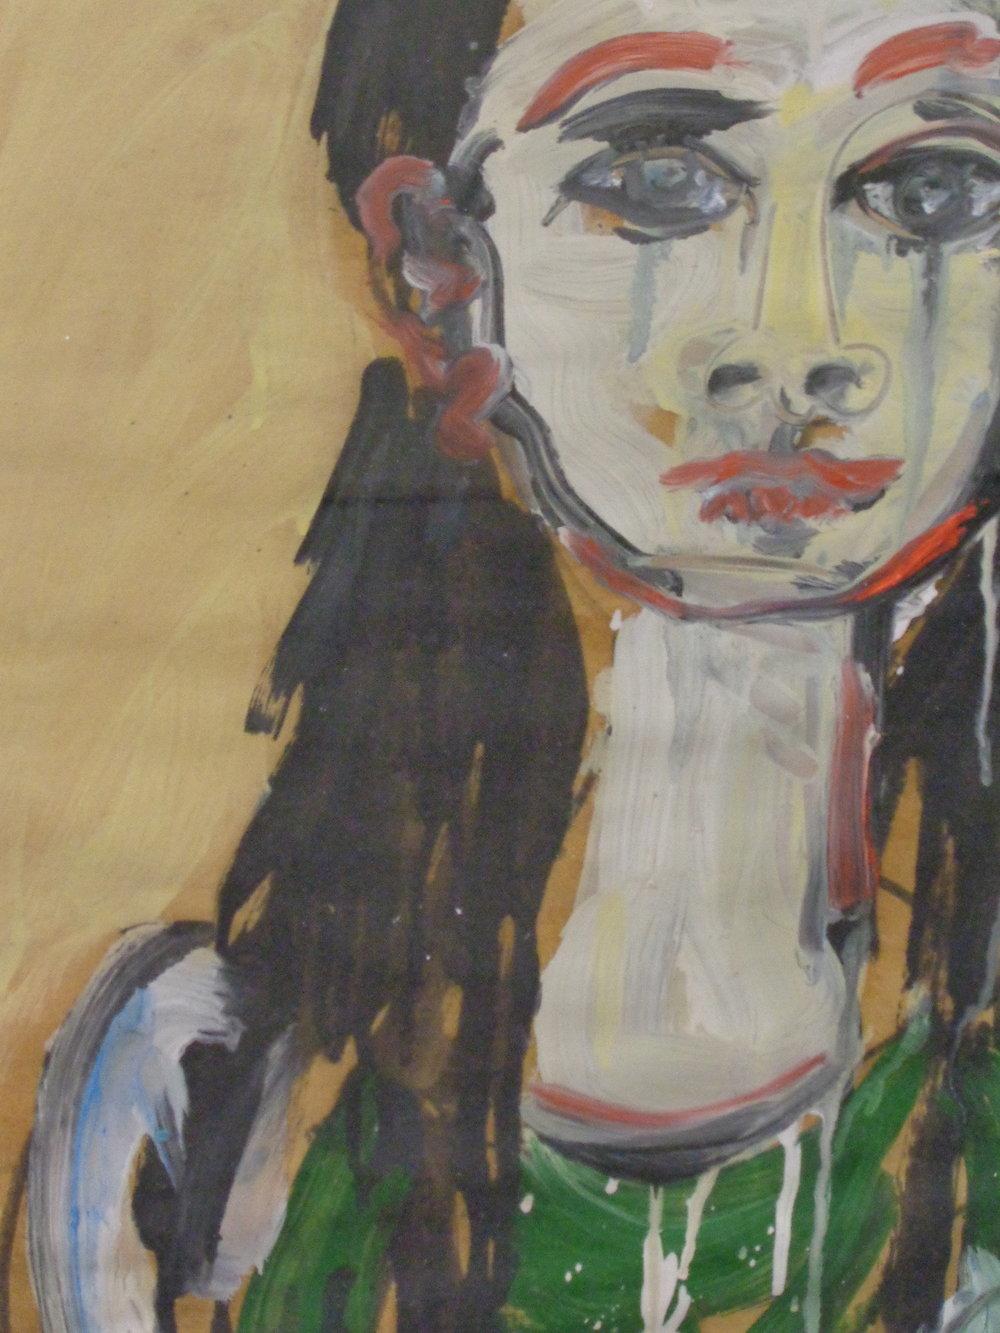 Sonoko Glaring - Oil on paper 2012